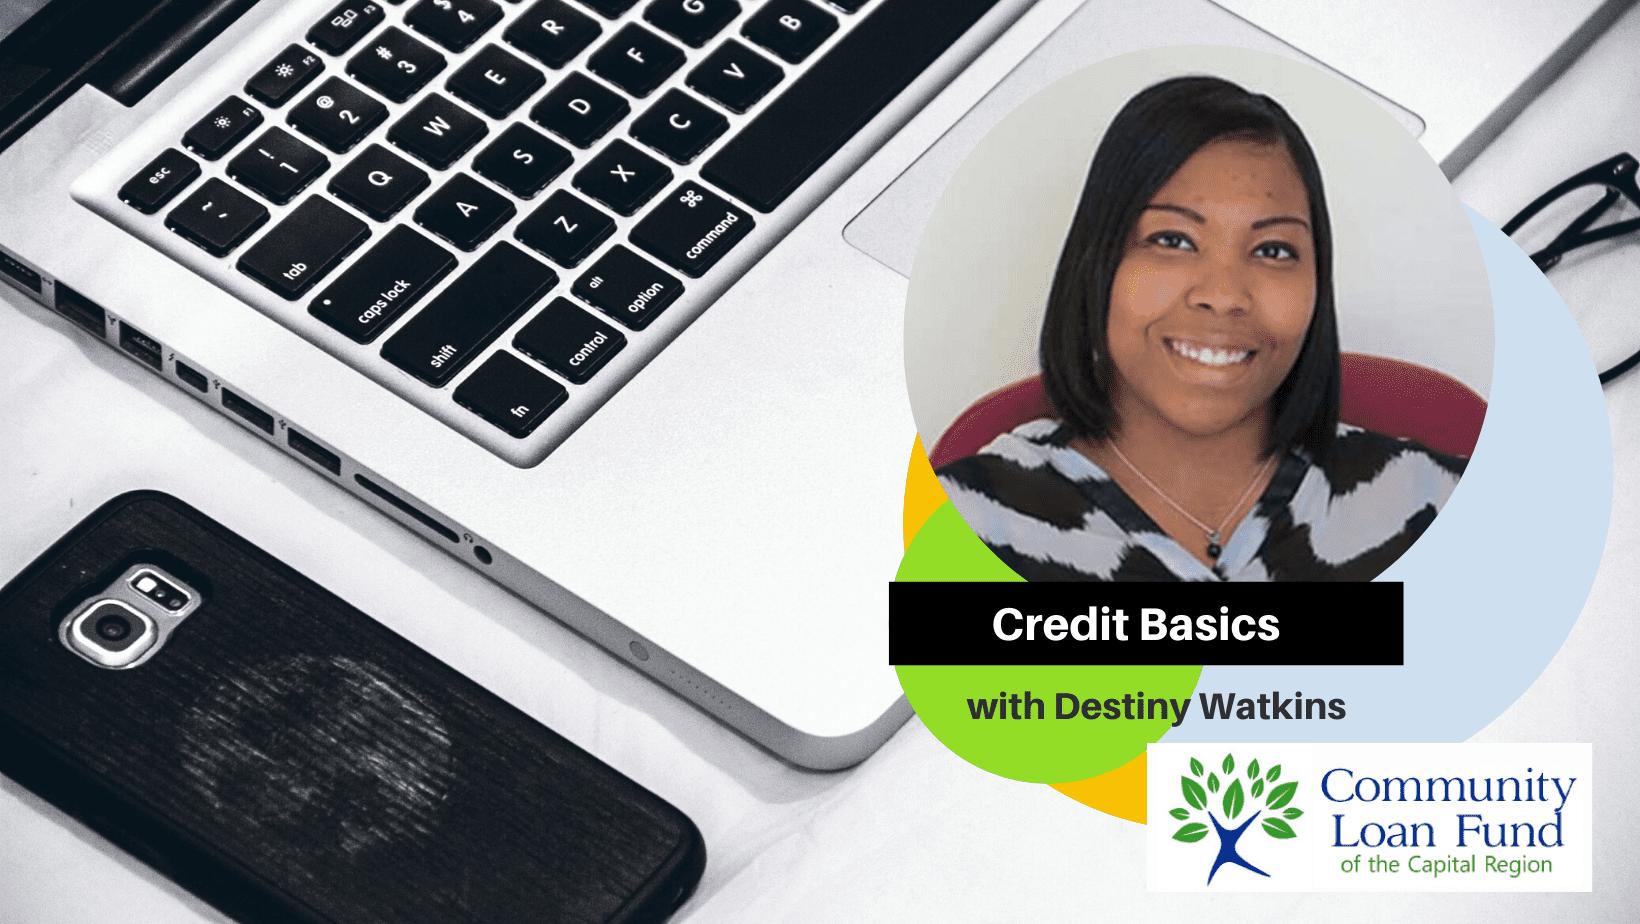 Credit Basics with Destiny Watkins